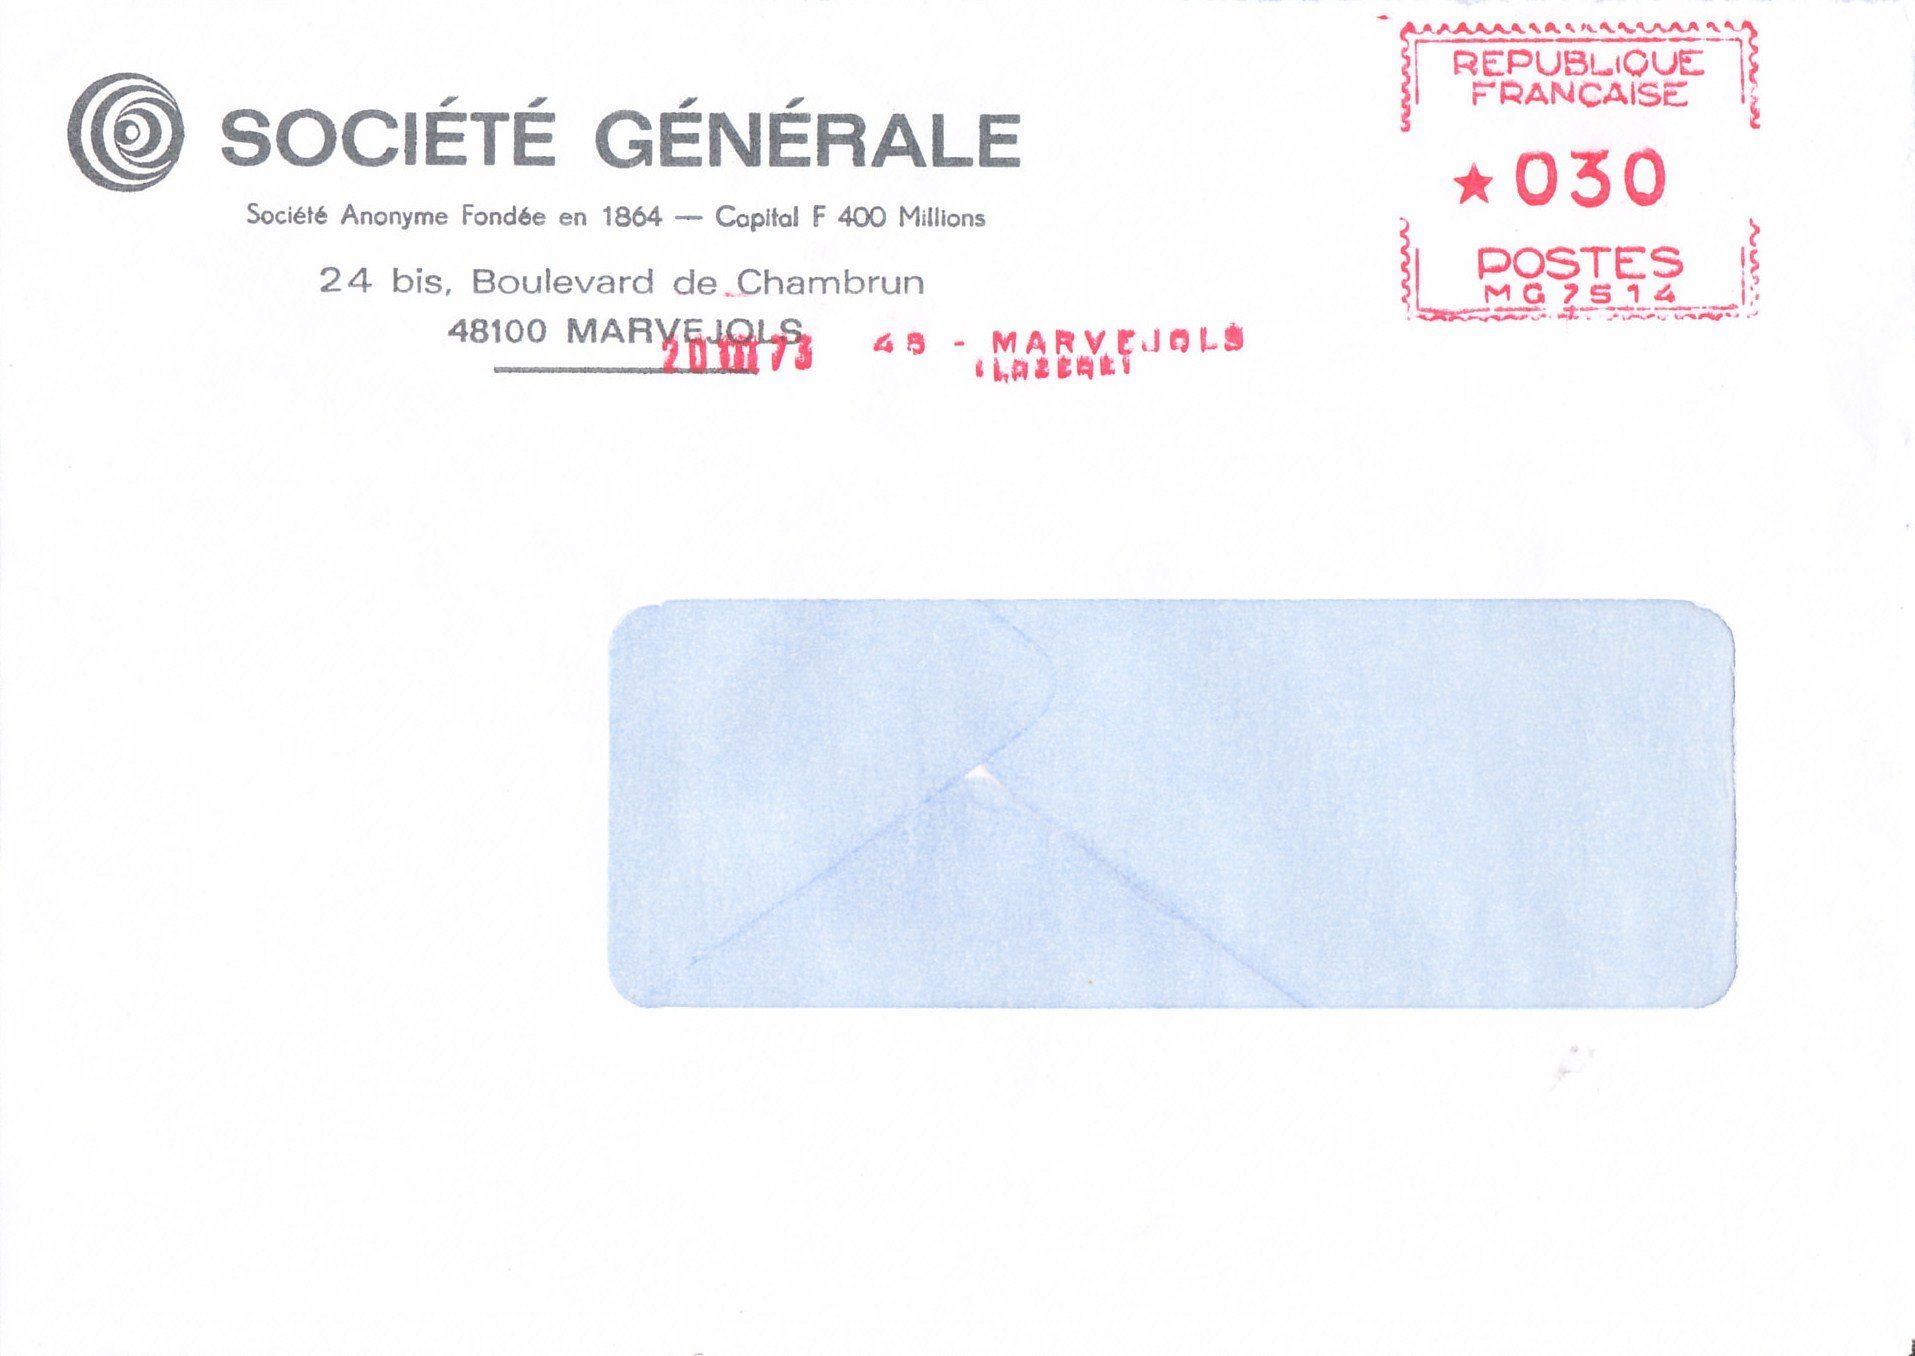 MG 7 514 0,30F